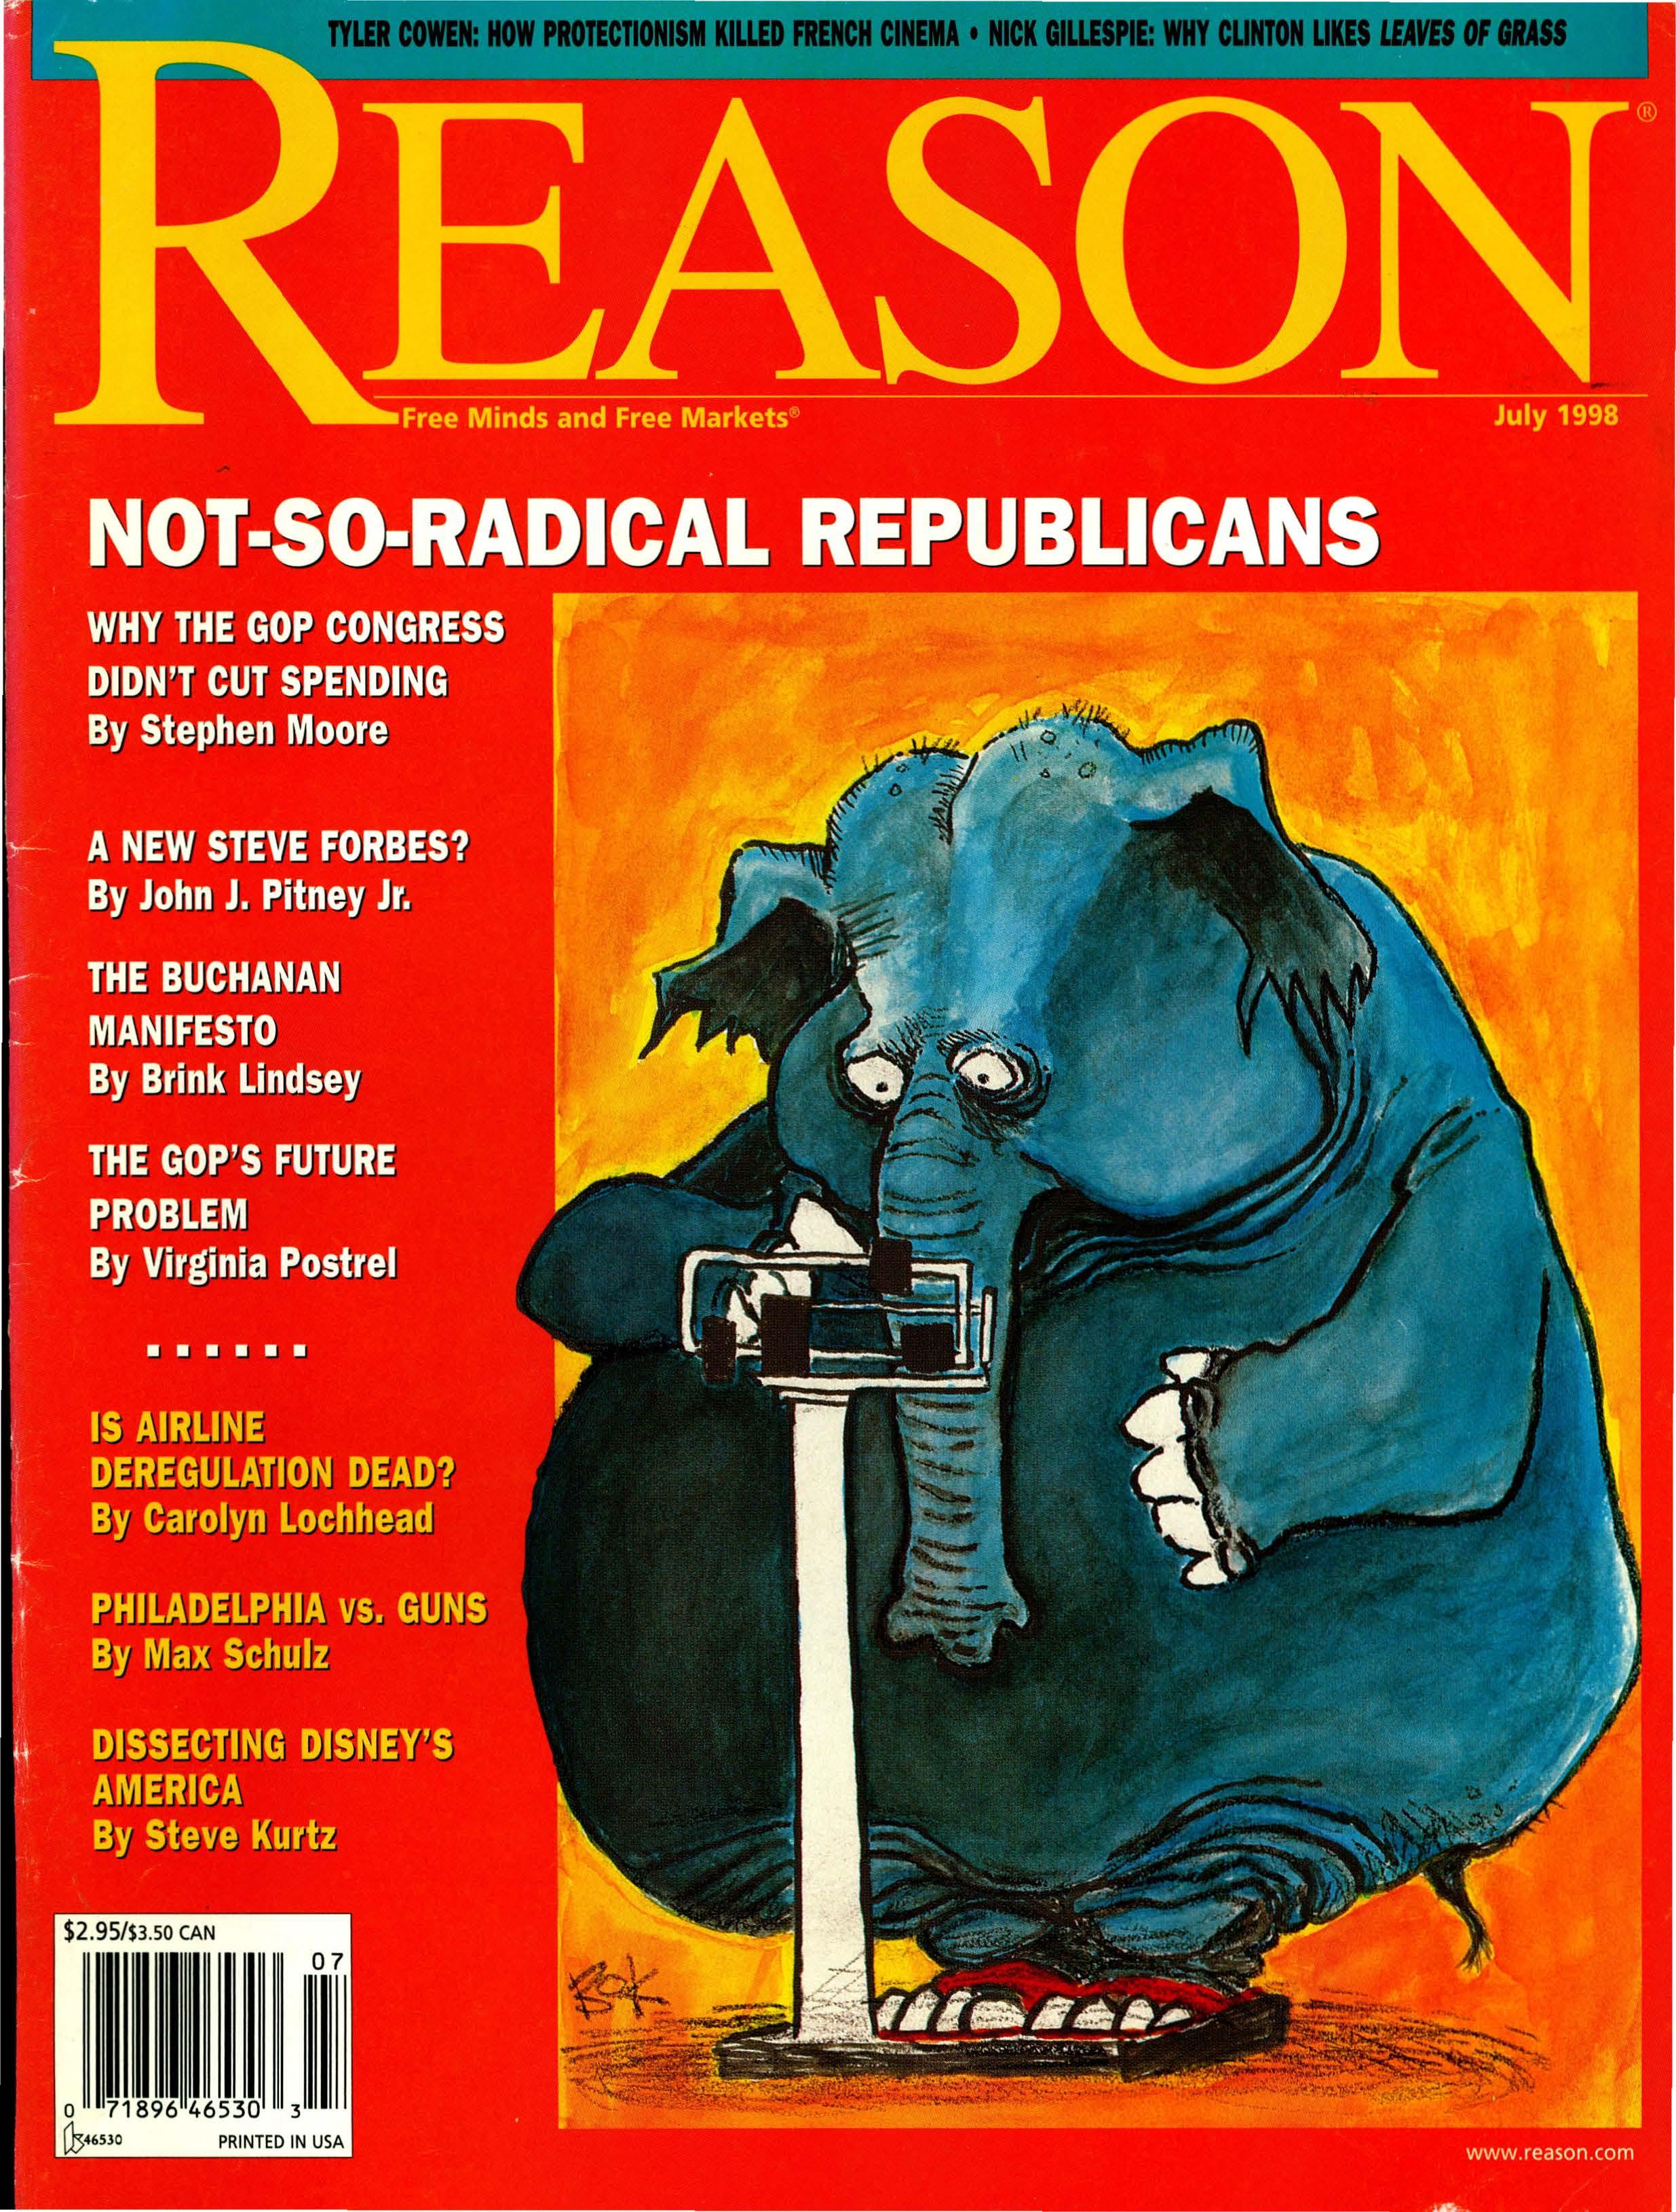 Reason Magazine, July 1998 cover image